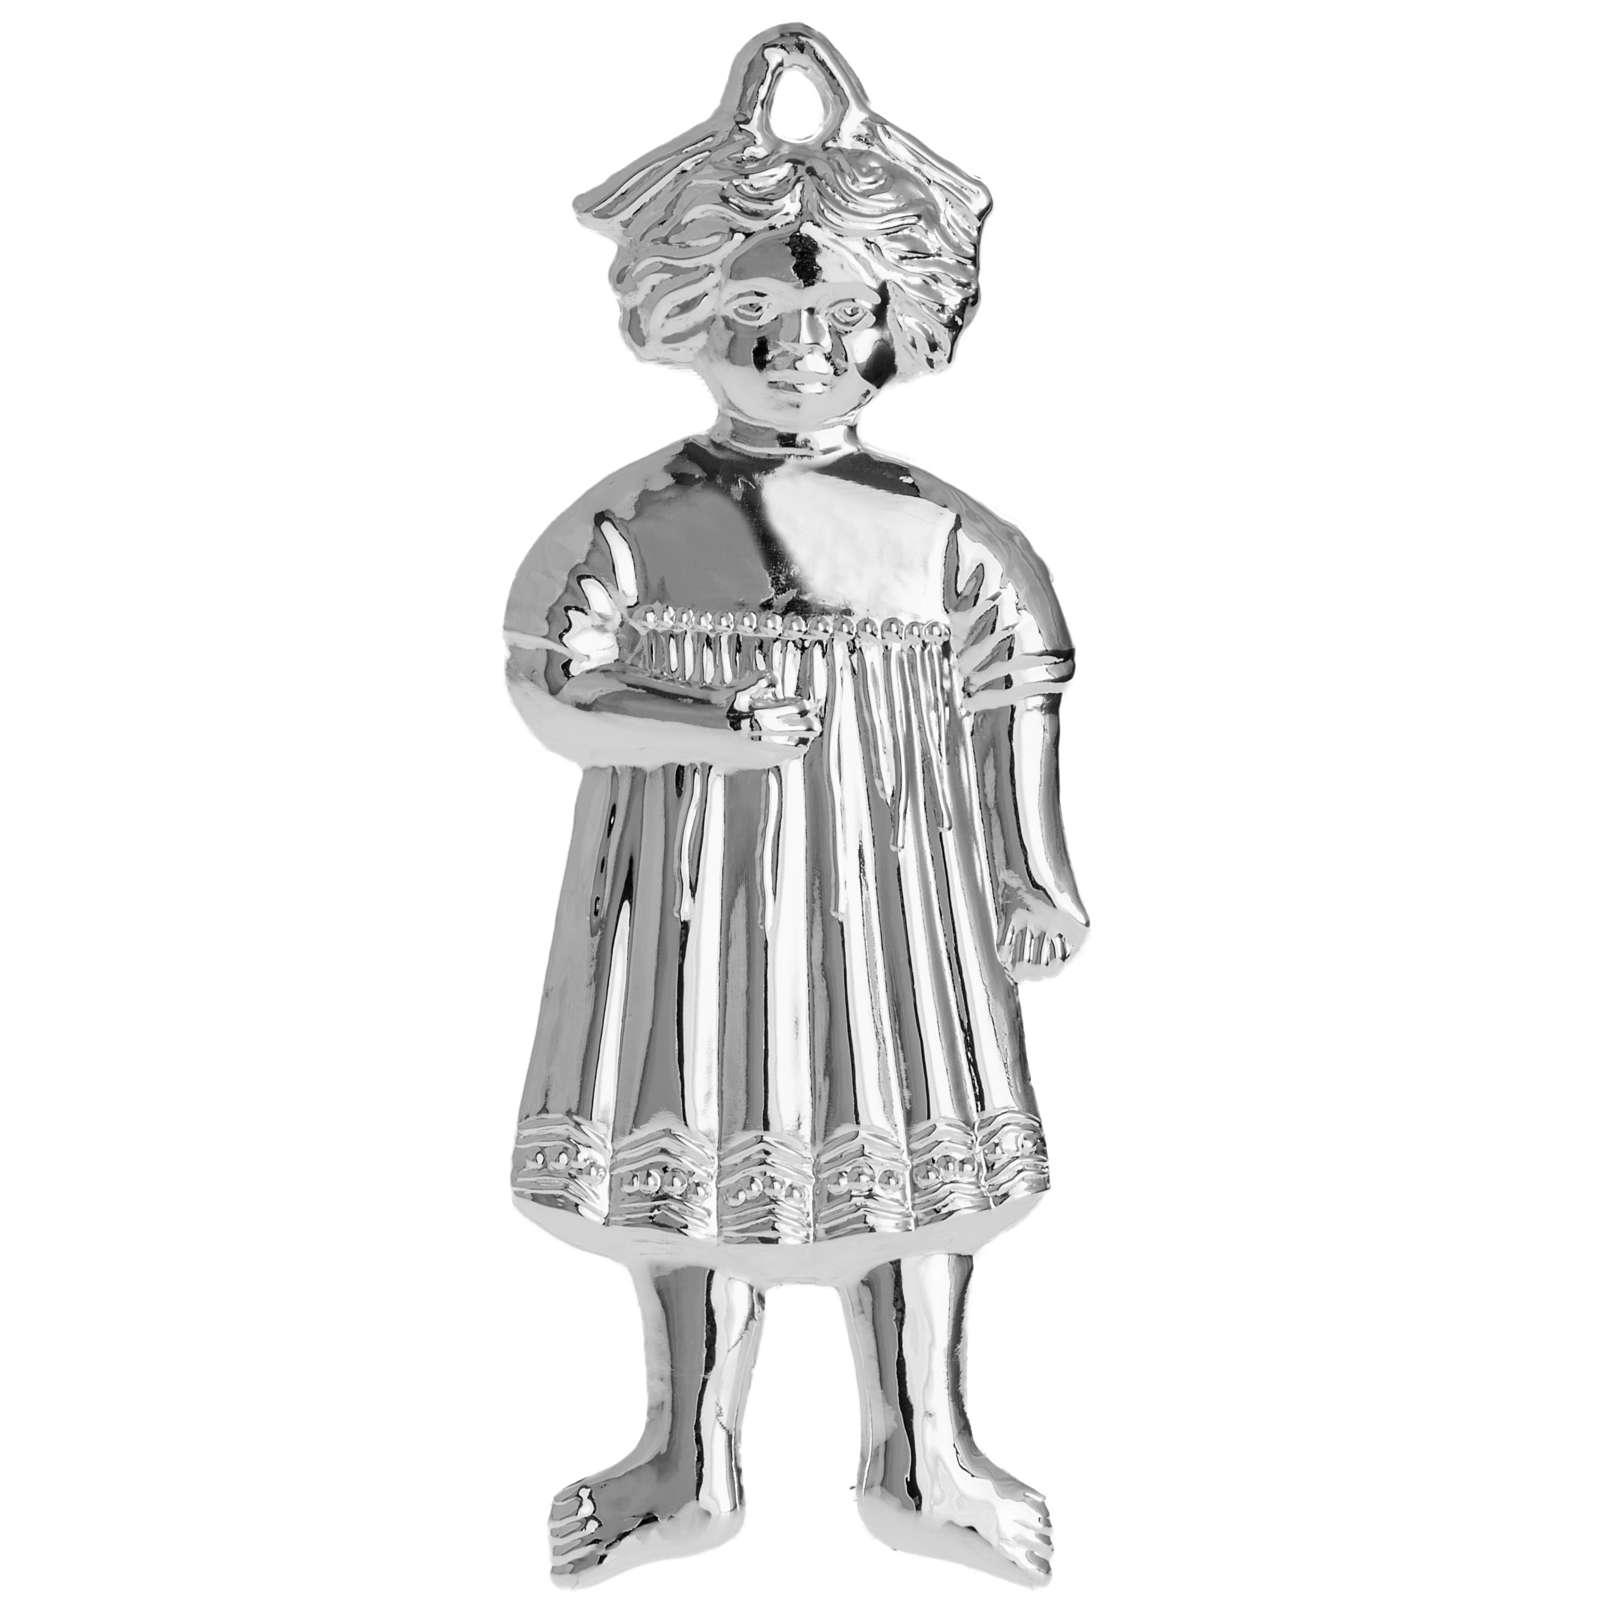 Ex-voto niña antigua plata 925 o metal 13 cm. 3